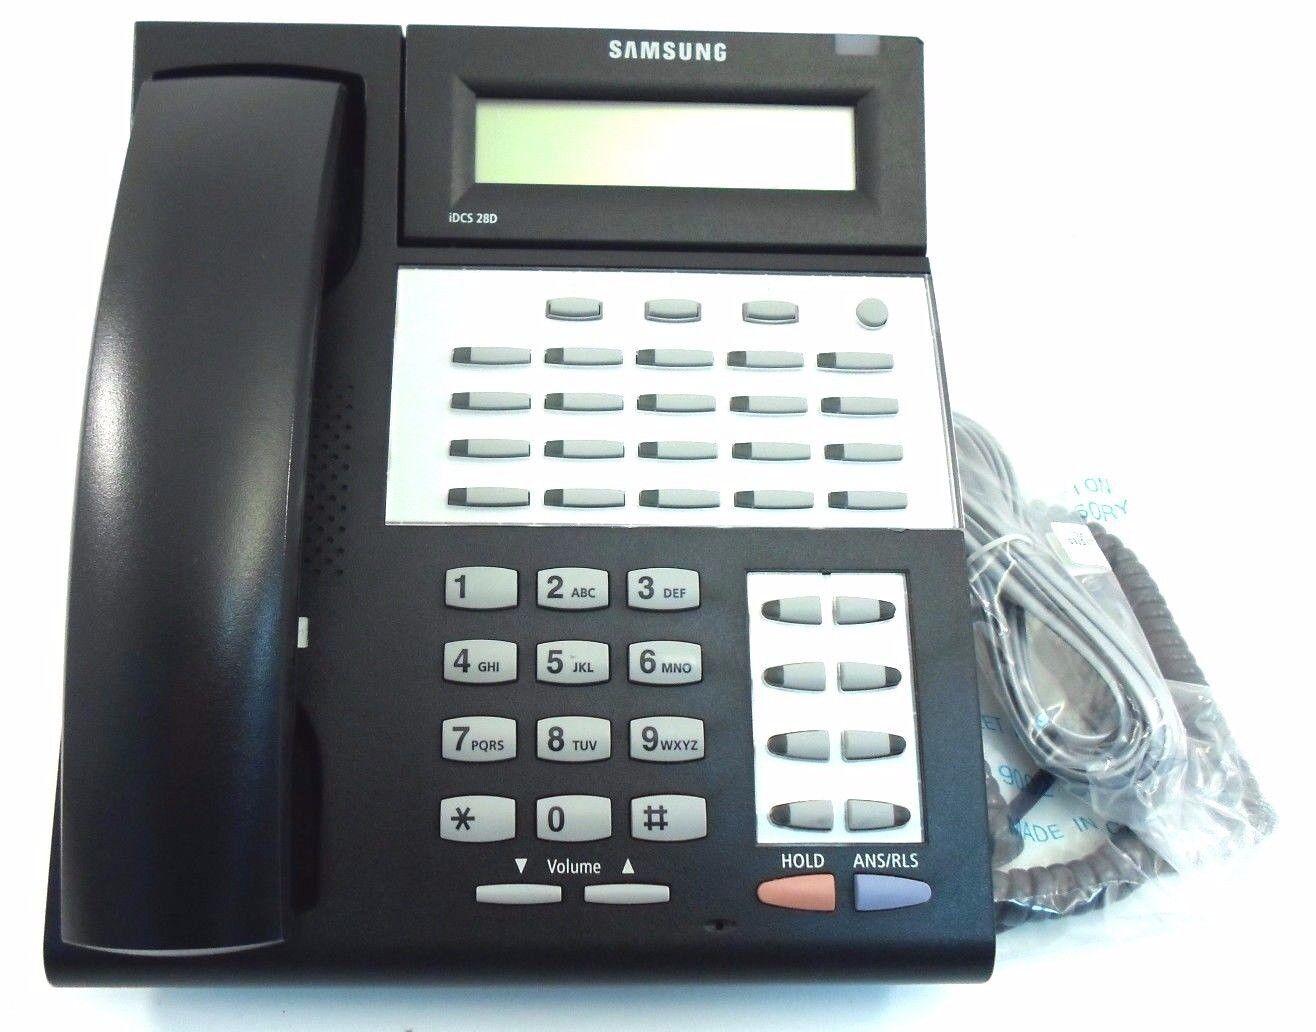 samsung idcs 28 button display speakerphone ebay rh ebay com samsung idcs 28d user guide Samsung iDCS 28D Admin Manual